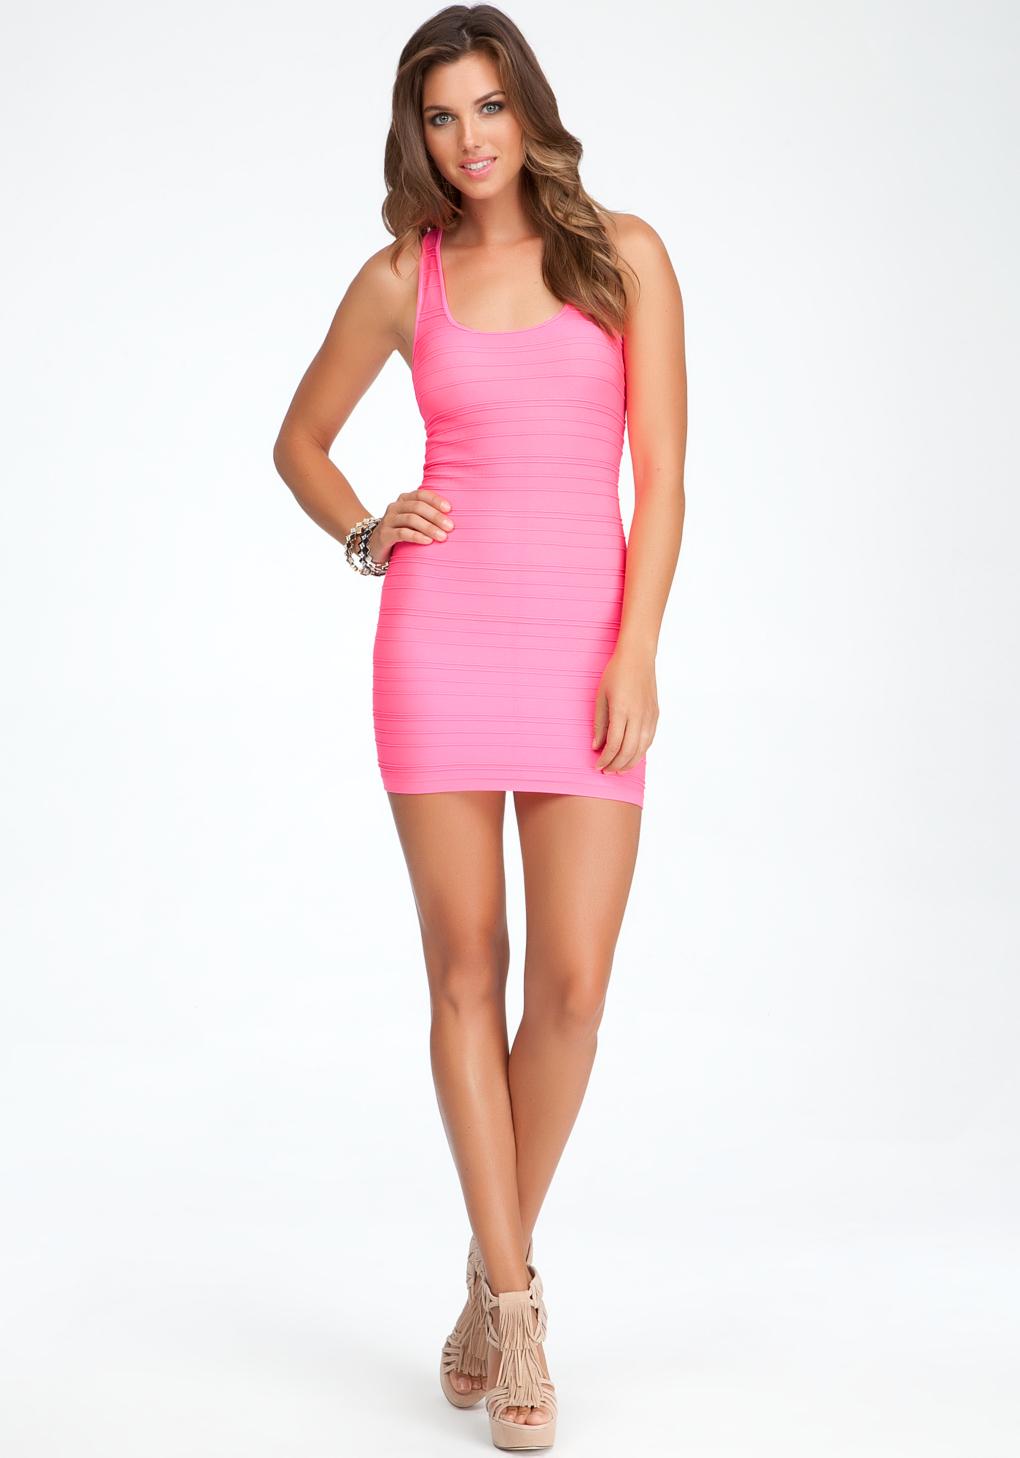 Lyst Bebe Braided Back Bodycon Tank Dress In Pink